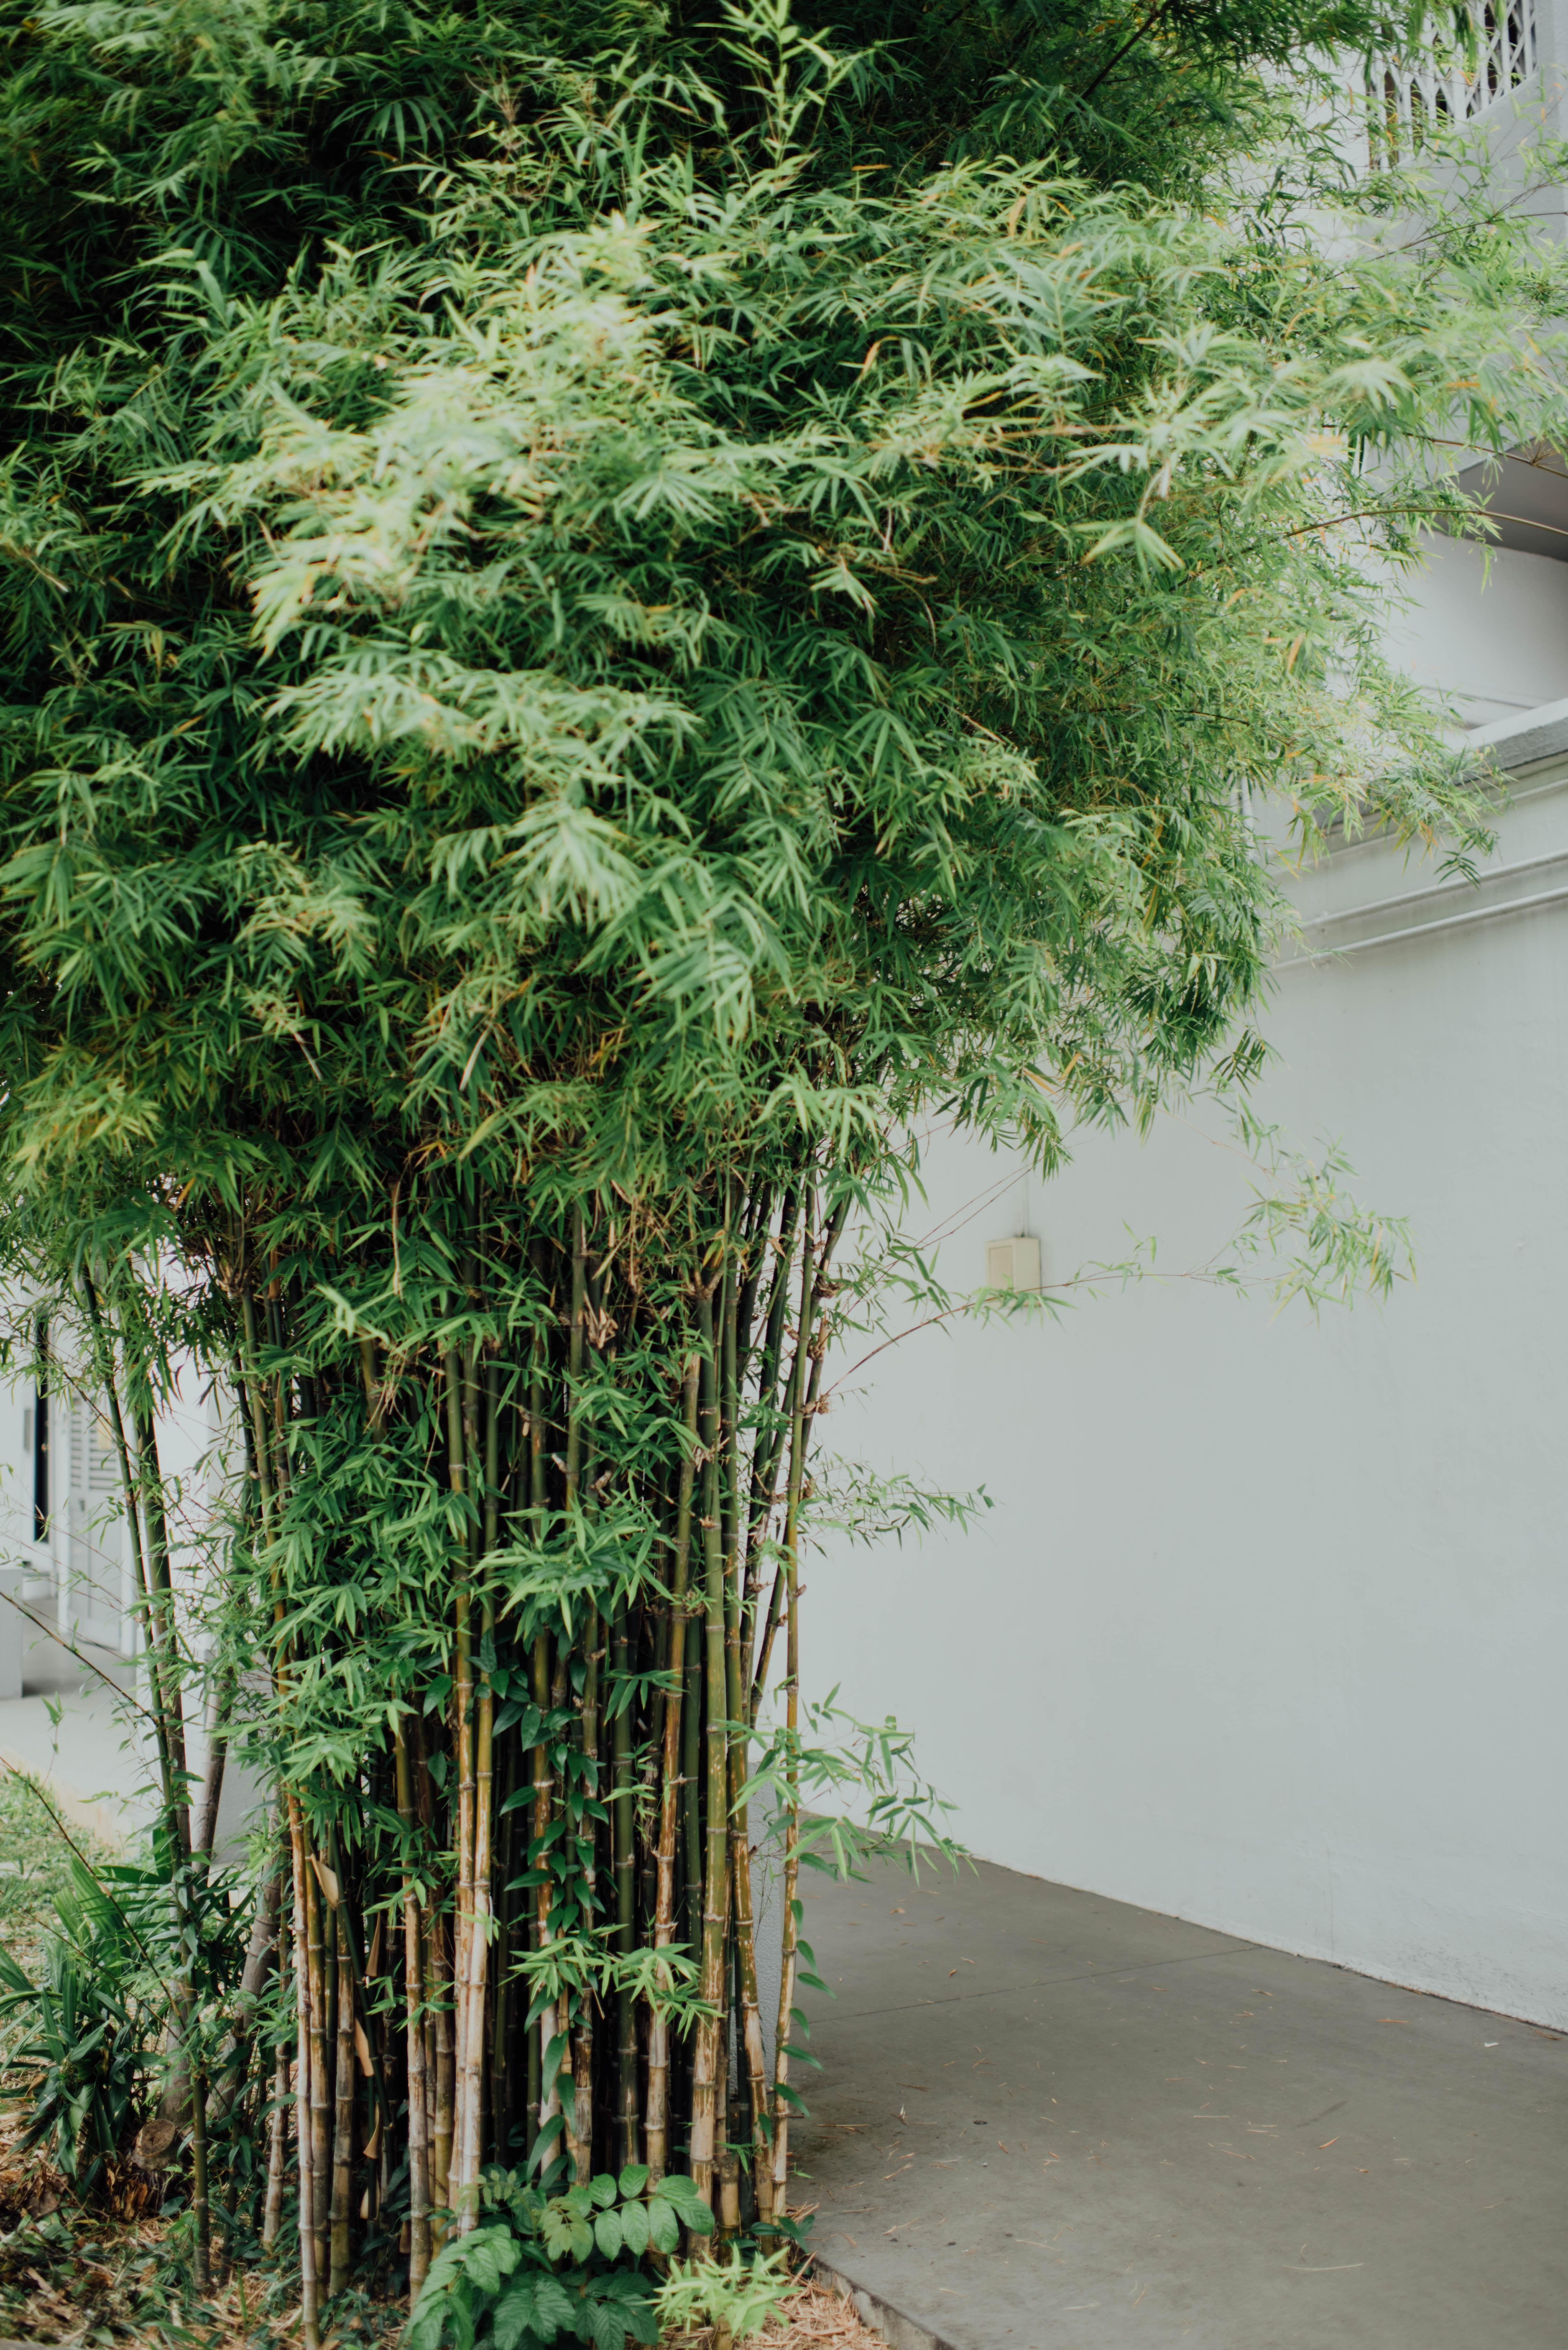 Bambu se propaga com facilidade.